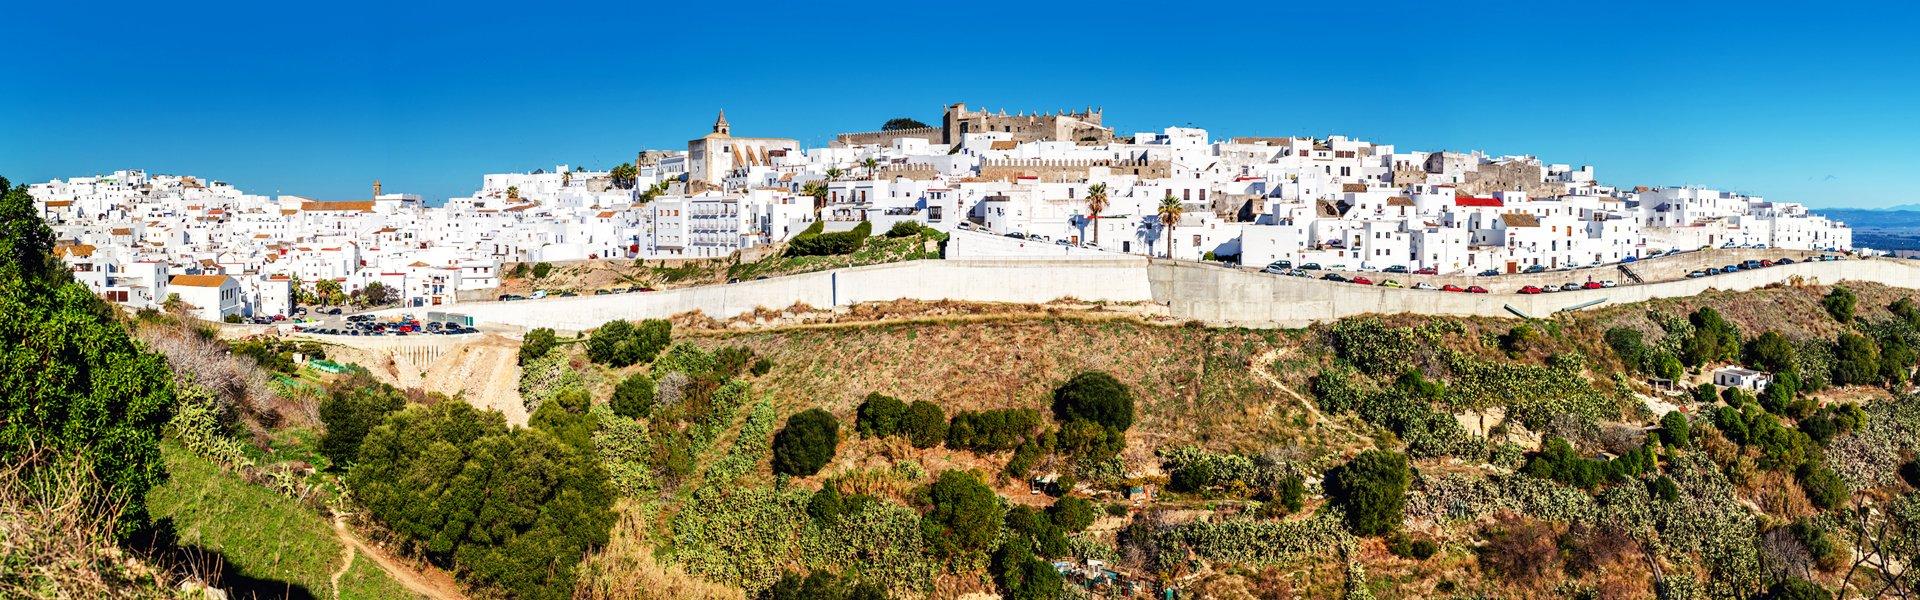 Witte dorpjes van Andalusië, Spanje